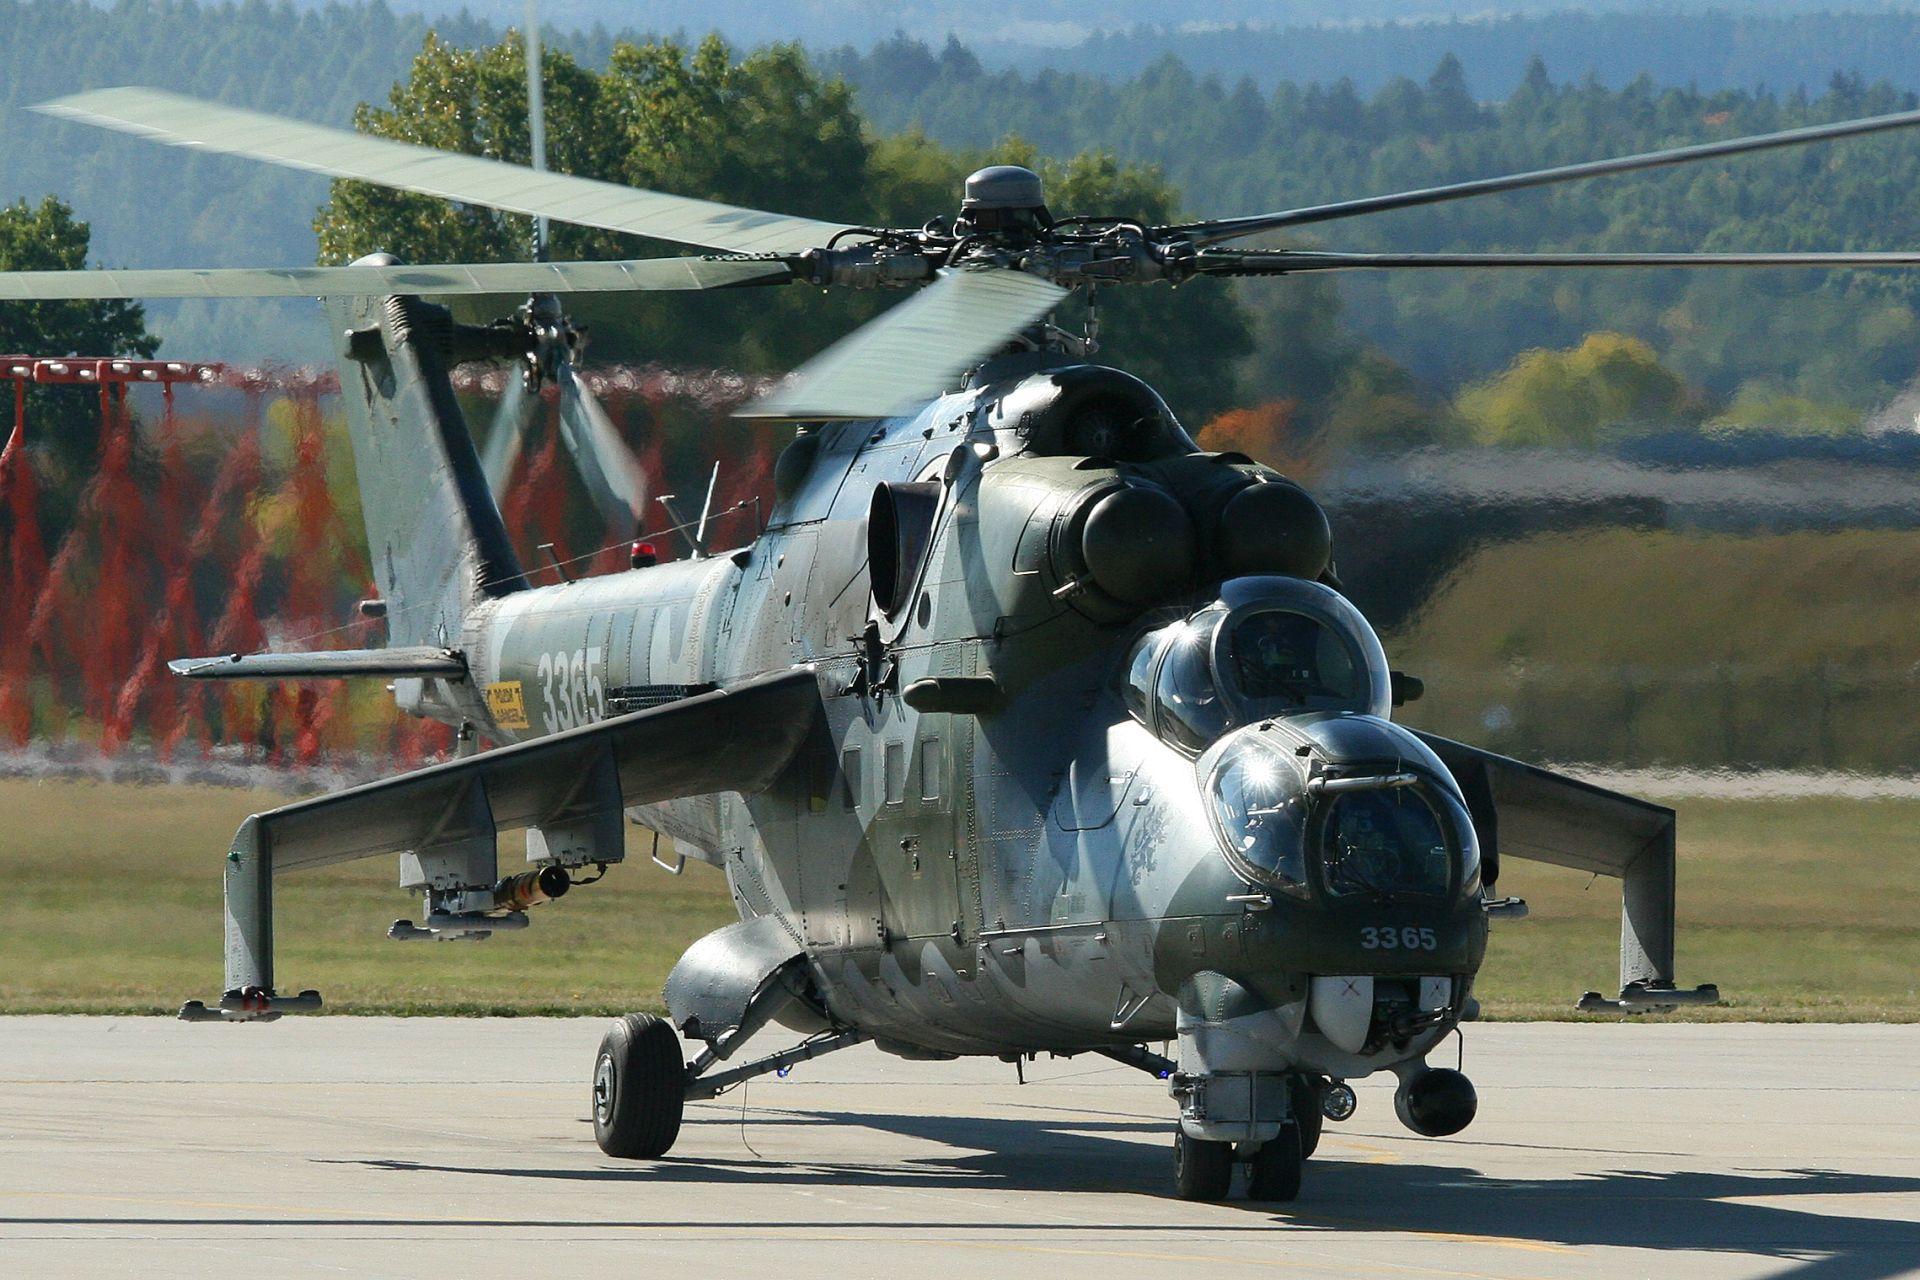 pakistan to buy russian mi 35 helicopter at defencetalk. Black Bedroom Furniture Sets. Home Design Ideas